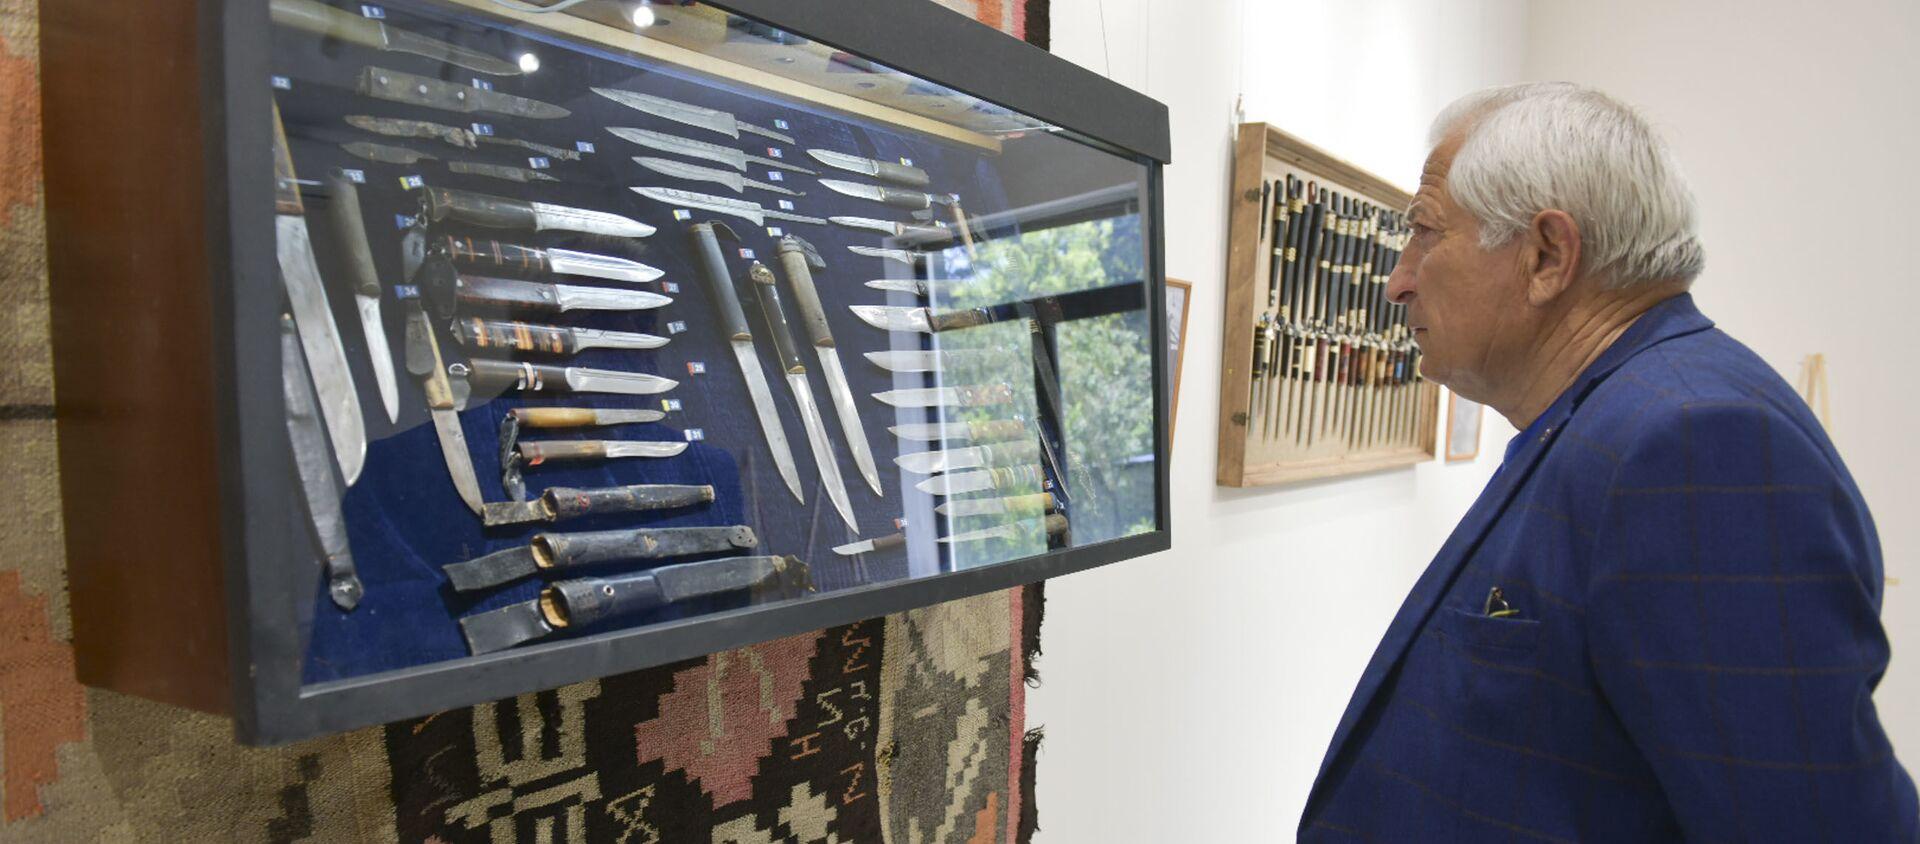 Выставка ножей открылась в музее Гудауты - Sputnik Абхазия, 1920, 18.05.2021